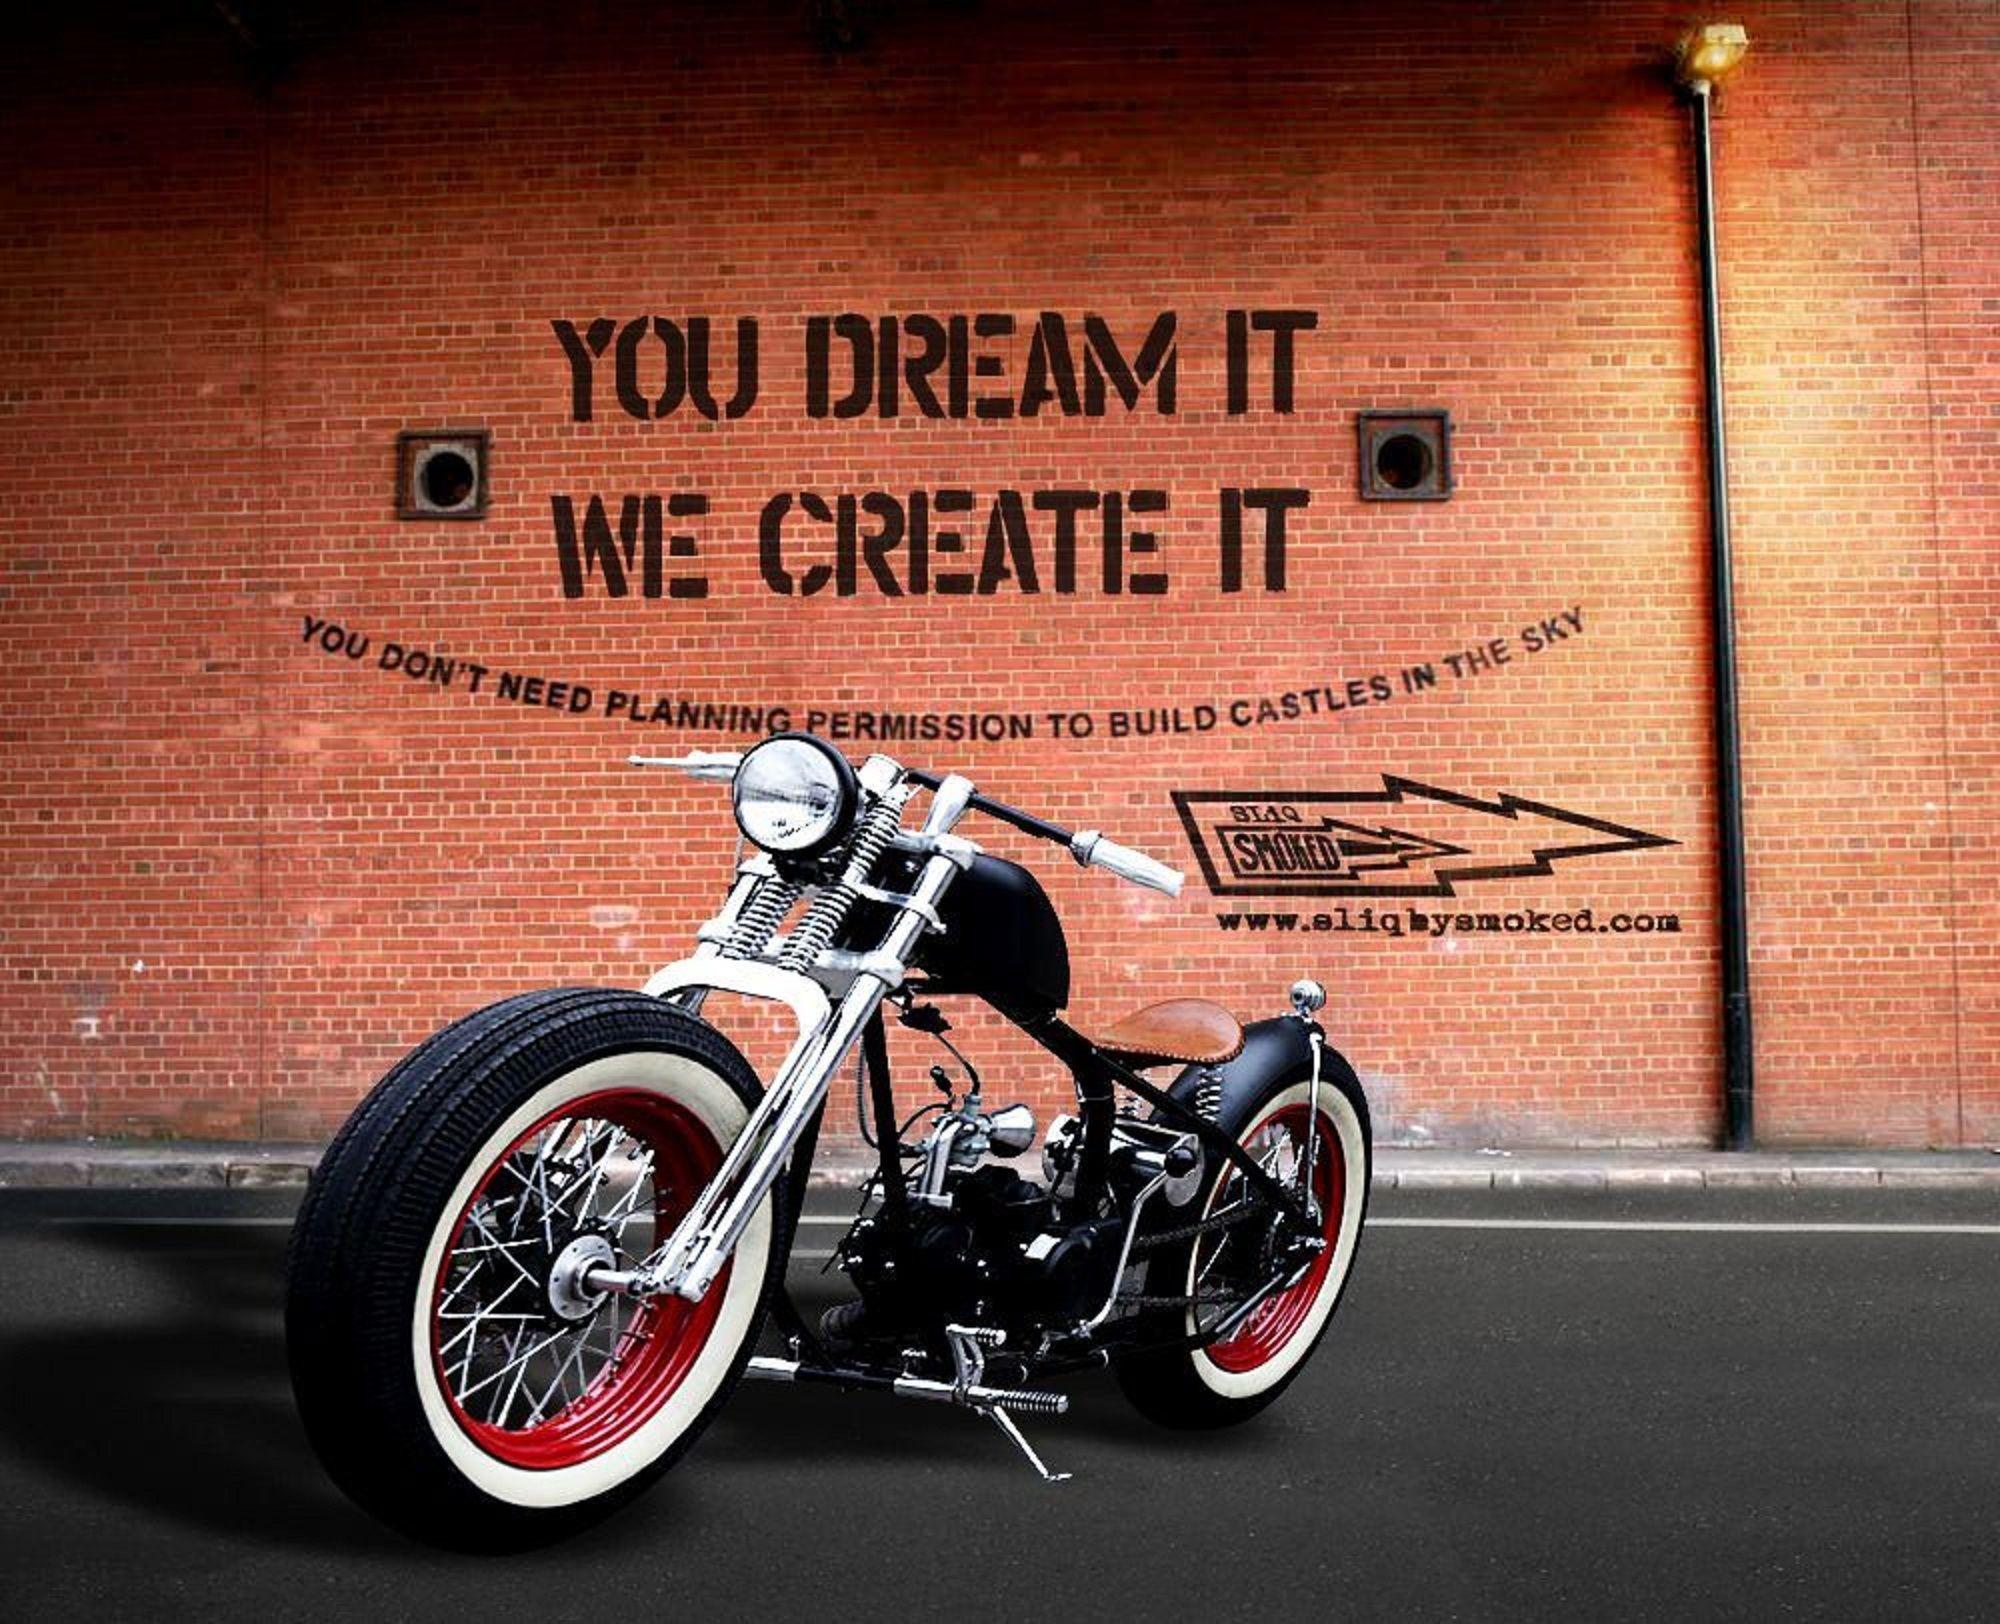 39 sliq by smoked 39 2015 custom motorcycle 125cc usa old skool bobber 250cc v twin option. Black Bedroom Furniture Sets. Home Design Ideas